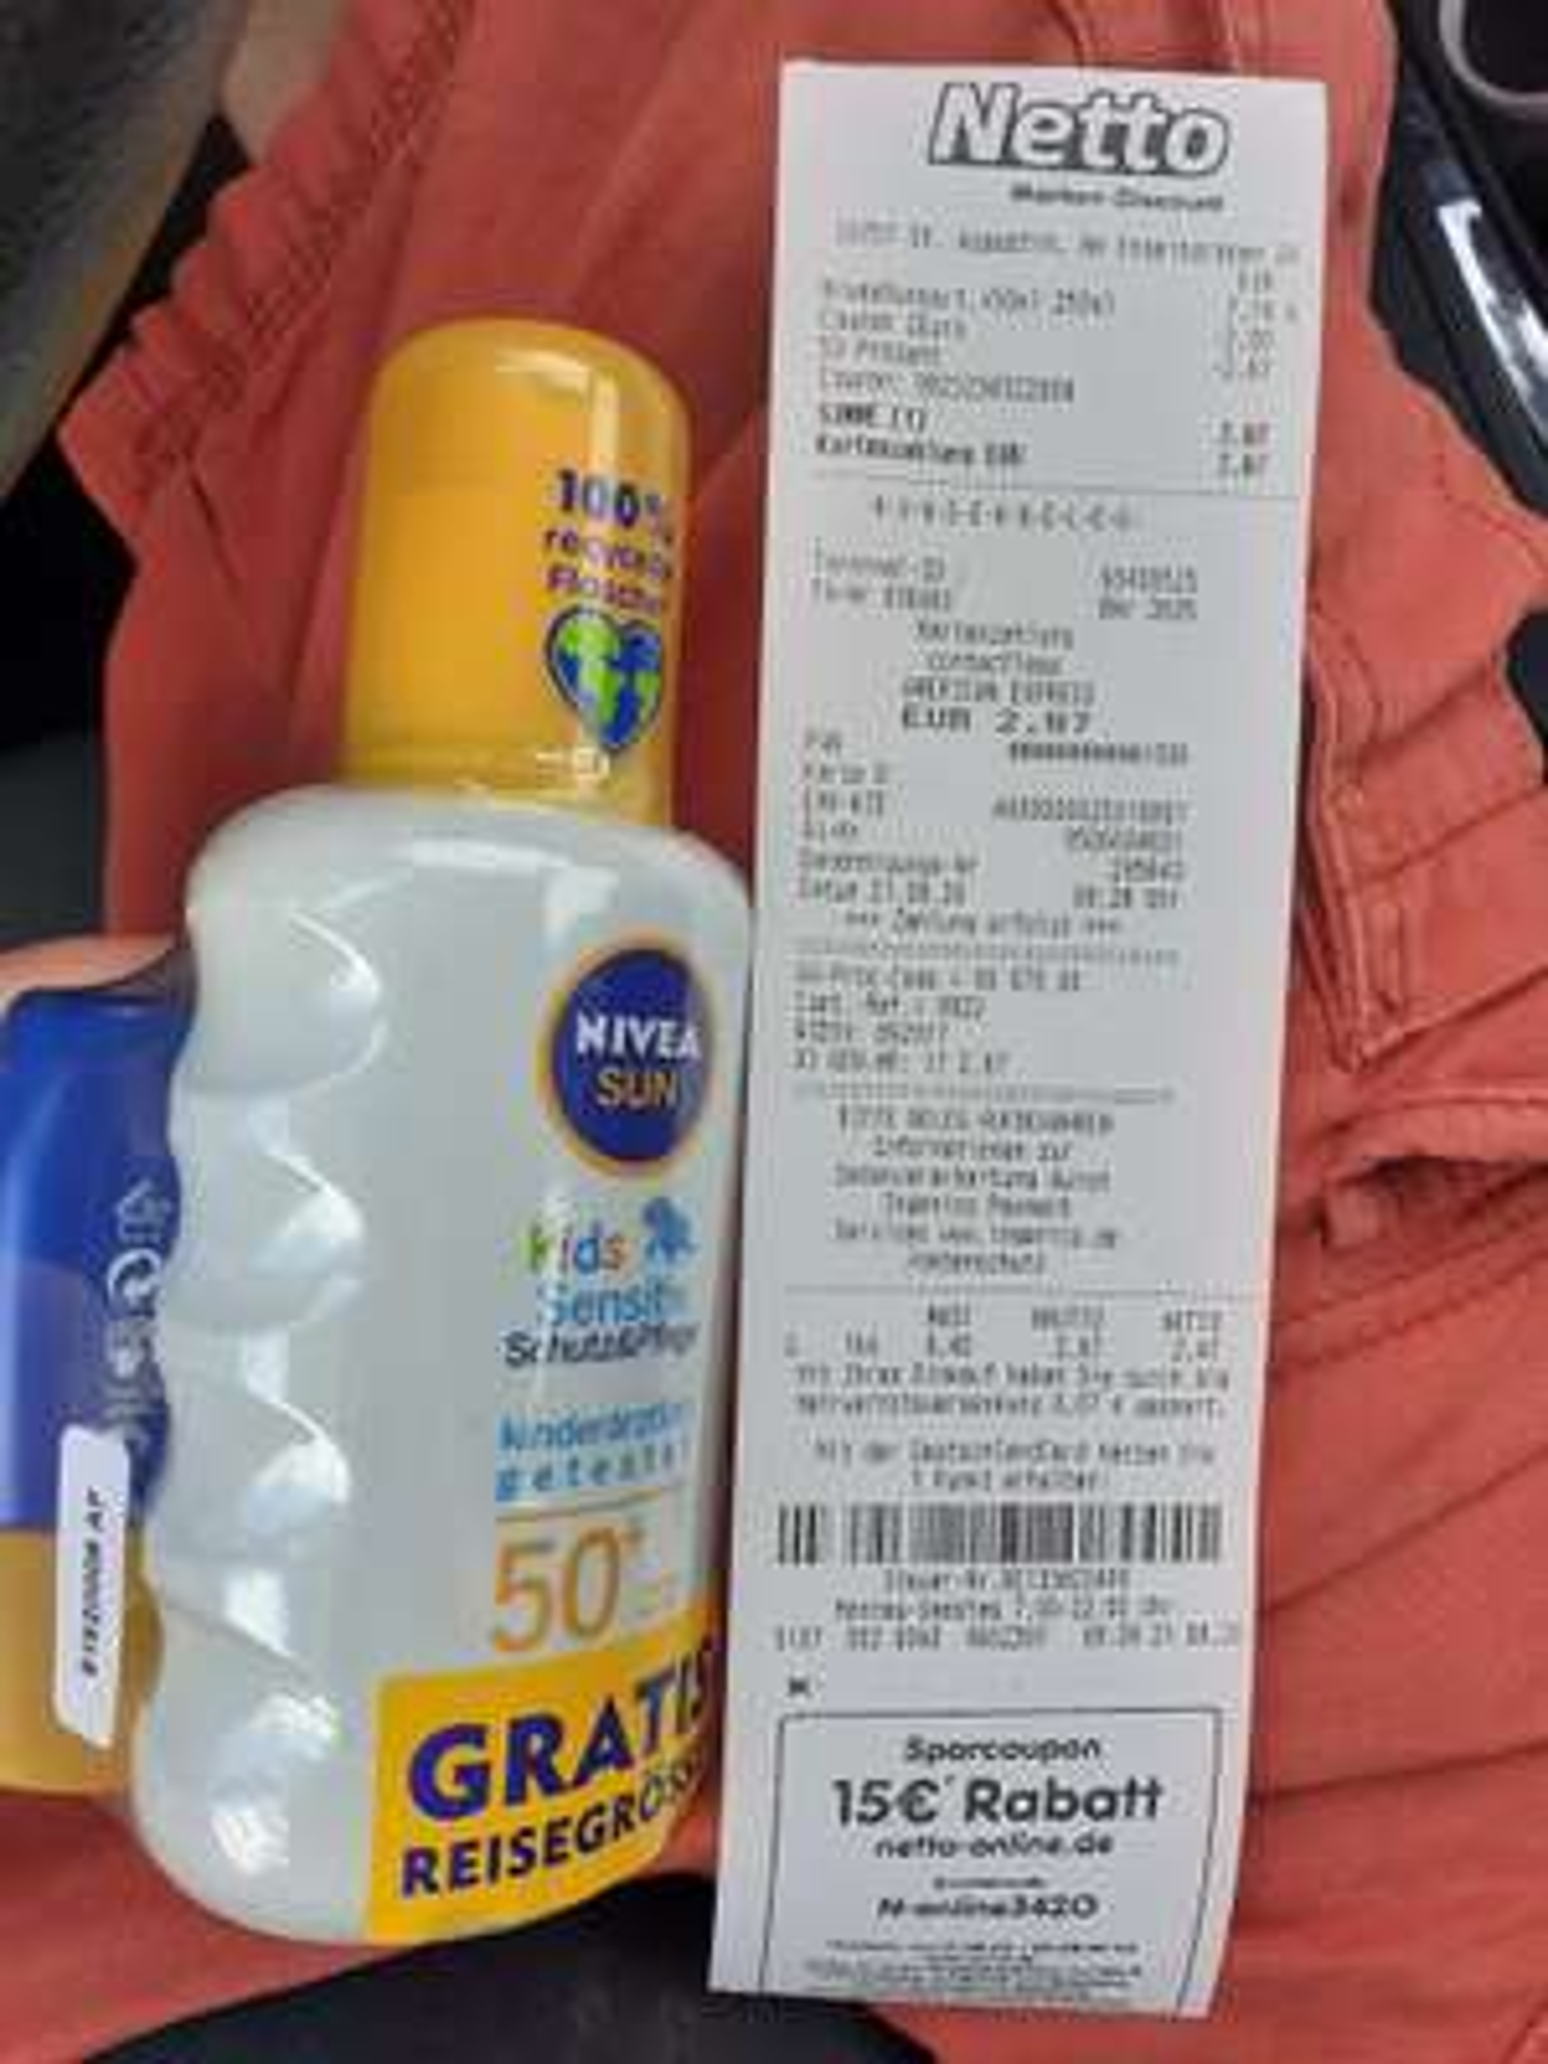 Nur heute! Nivea Sun Sonnencreme mit Coupon bei Netto für 2,87€